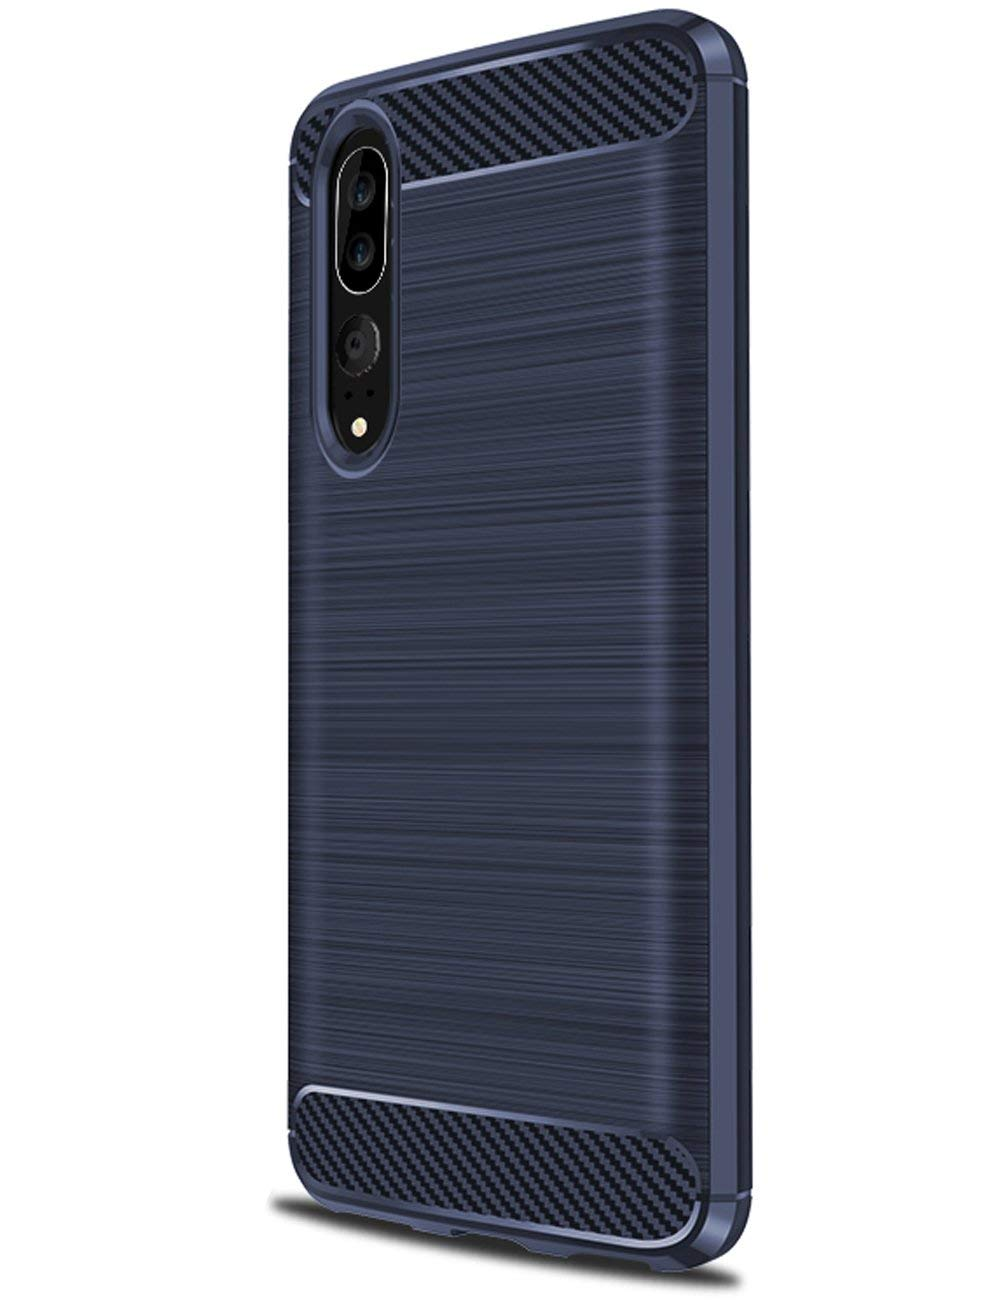 Coque-Etui-Housse-Silicone-brossee-Fibre-de-carbone-Noir-Protection-Huawei miniature 4